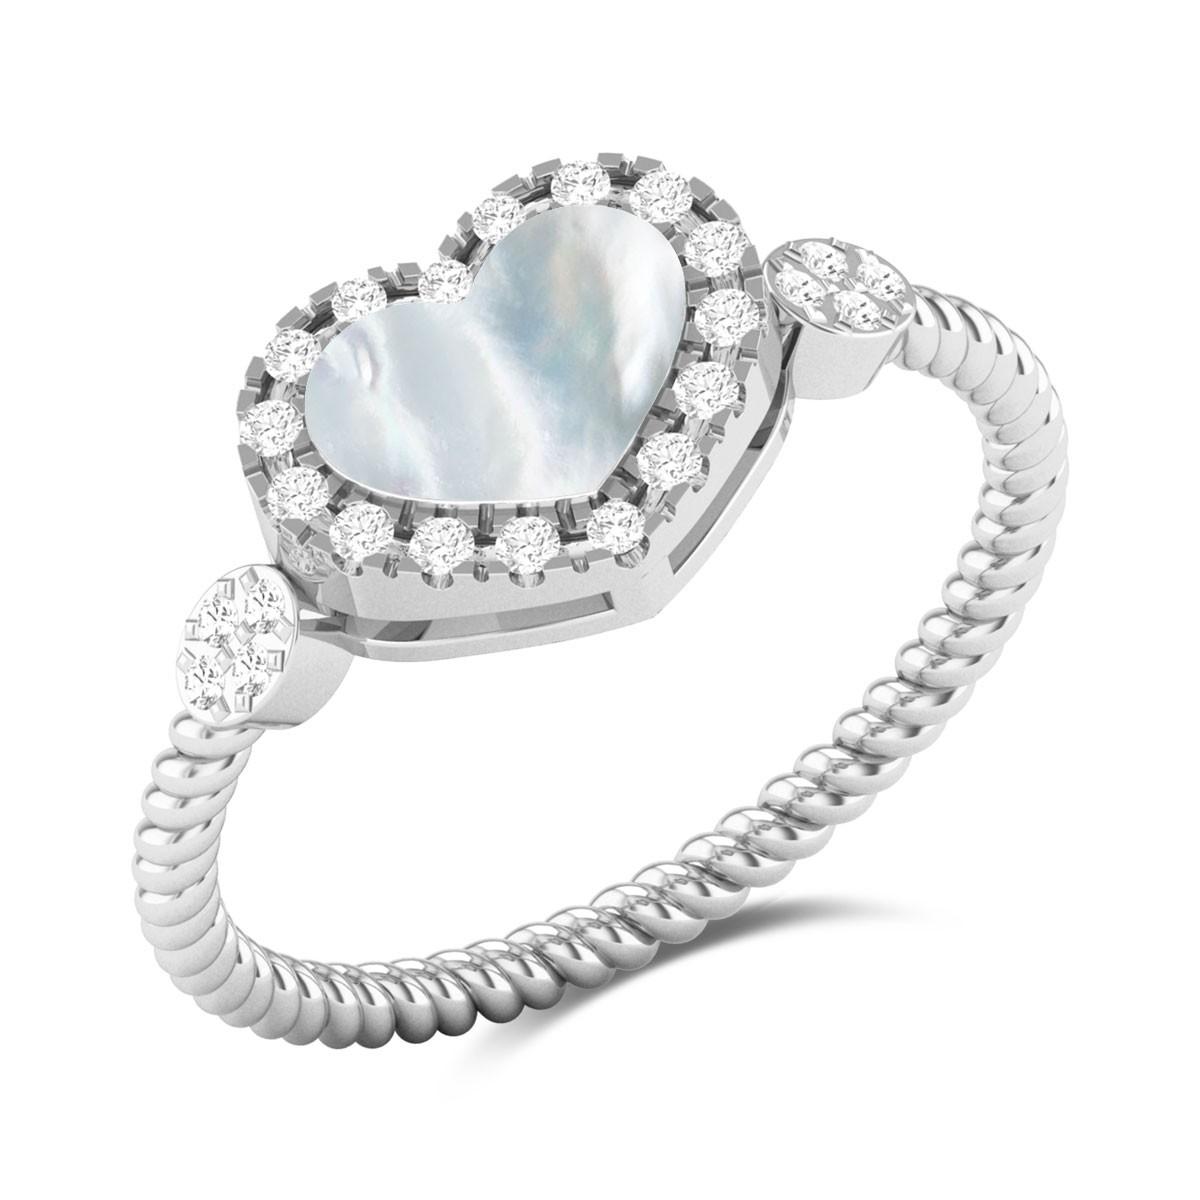 Roleno Diamond Ring